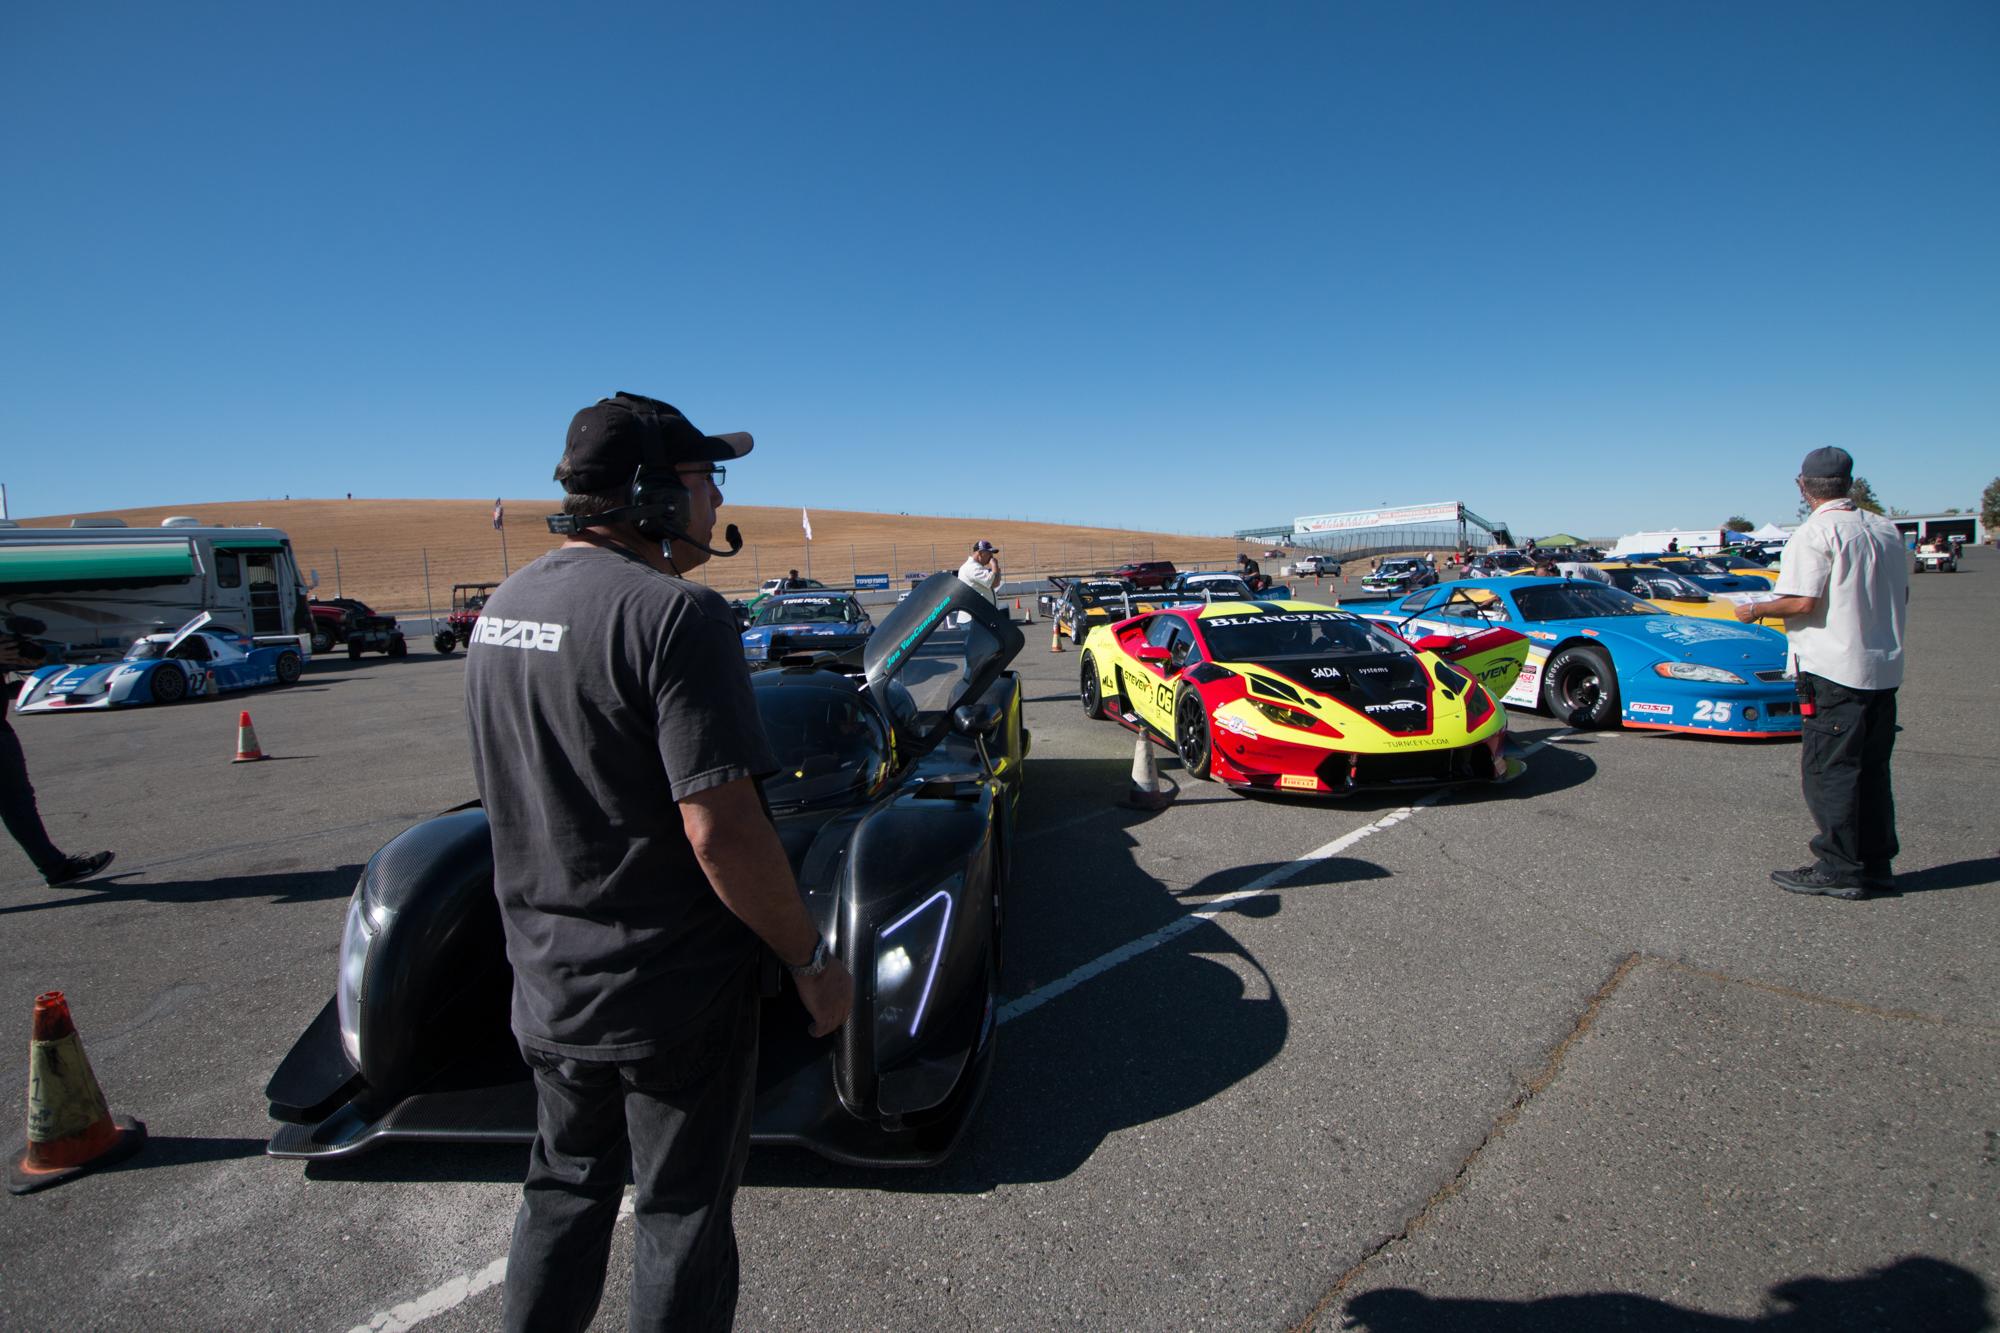 Steven-Racing-20130206-45672.jpg